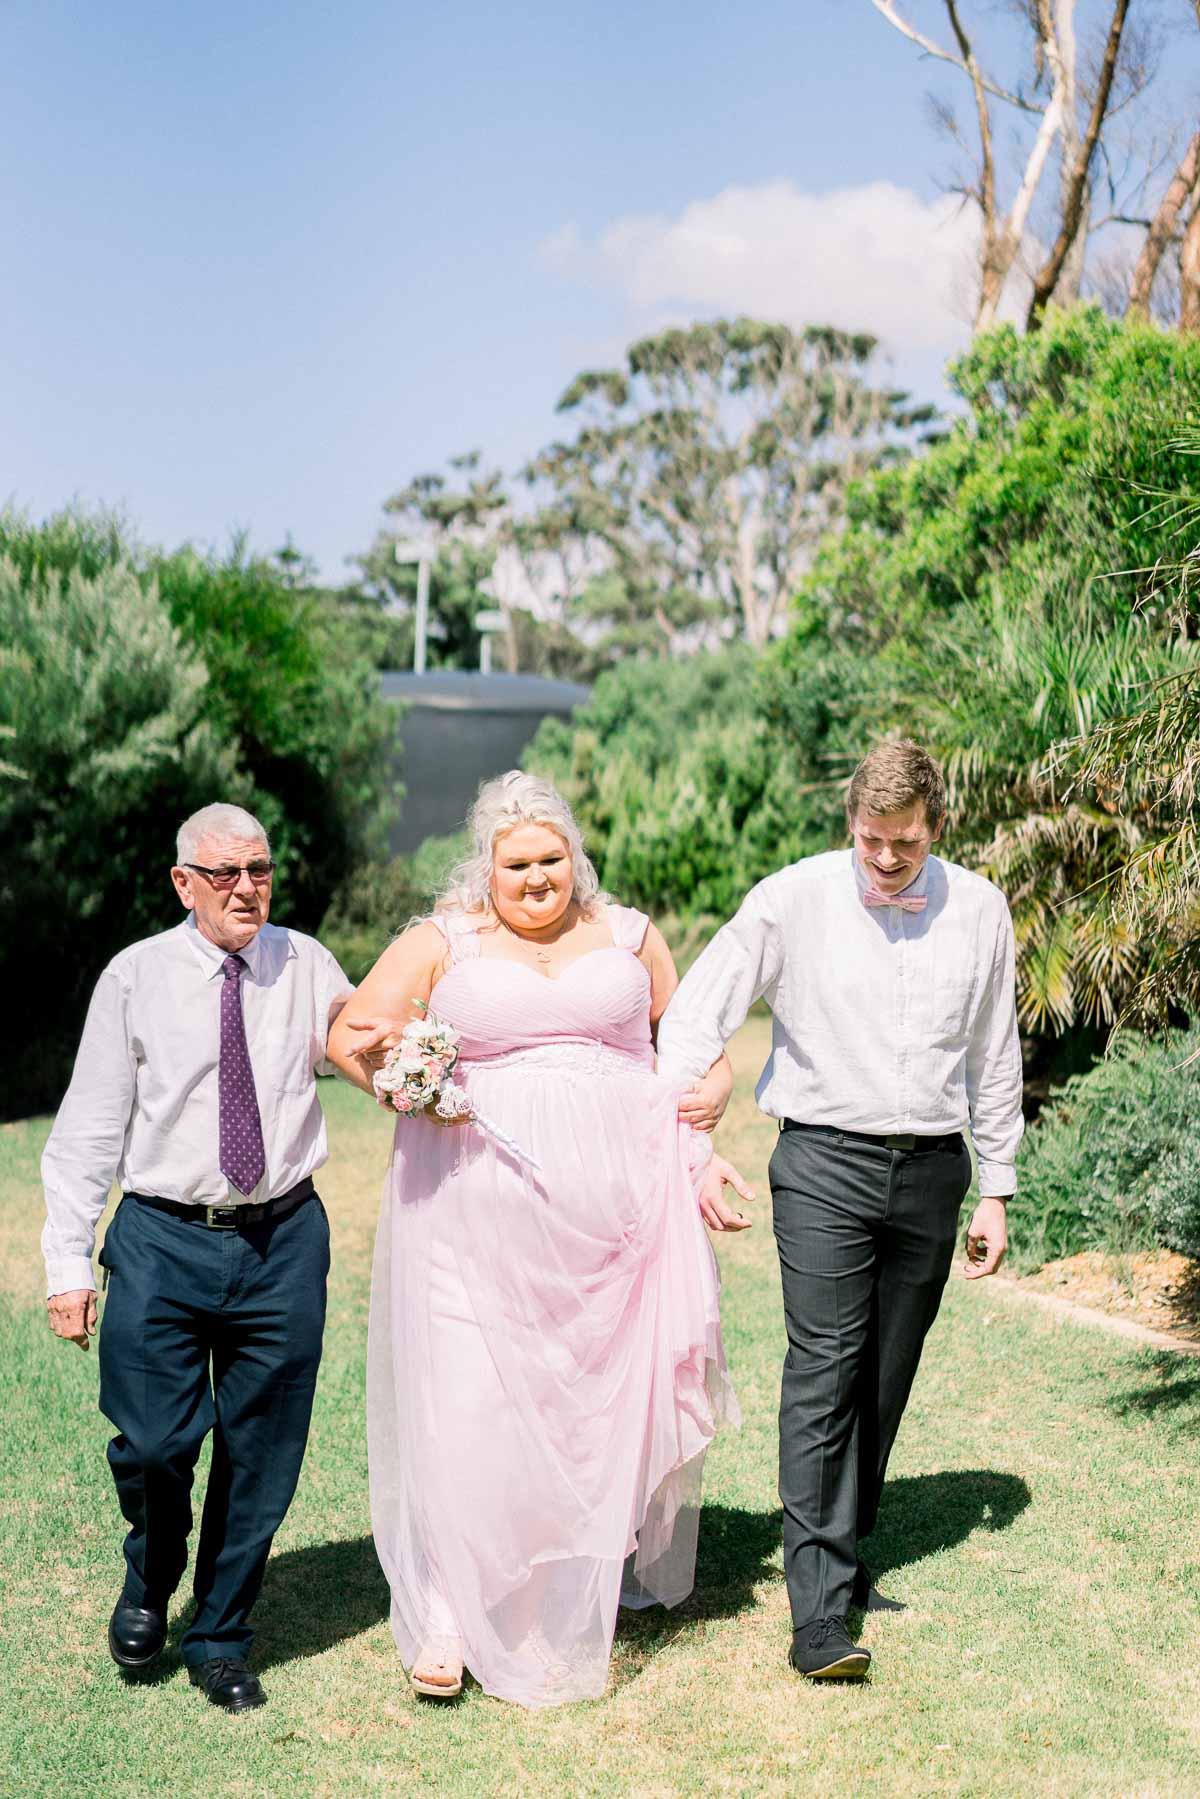 mt-eliza-mornington-peninsula-backyard-wedding-heart+soul-weddings-allison-matt-03163.jpg